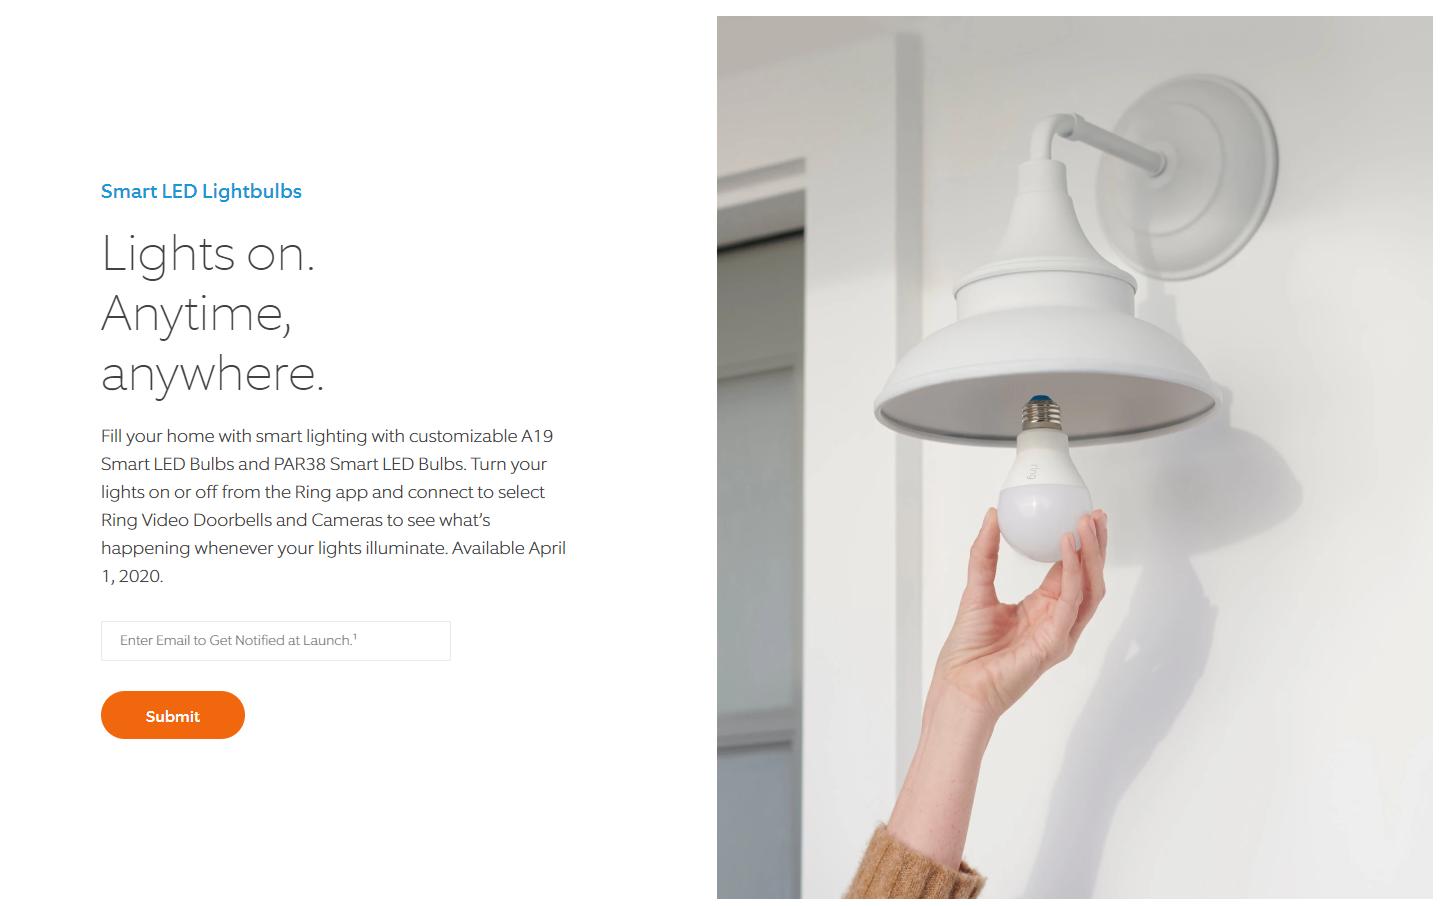 Ring Smart LED bulbs